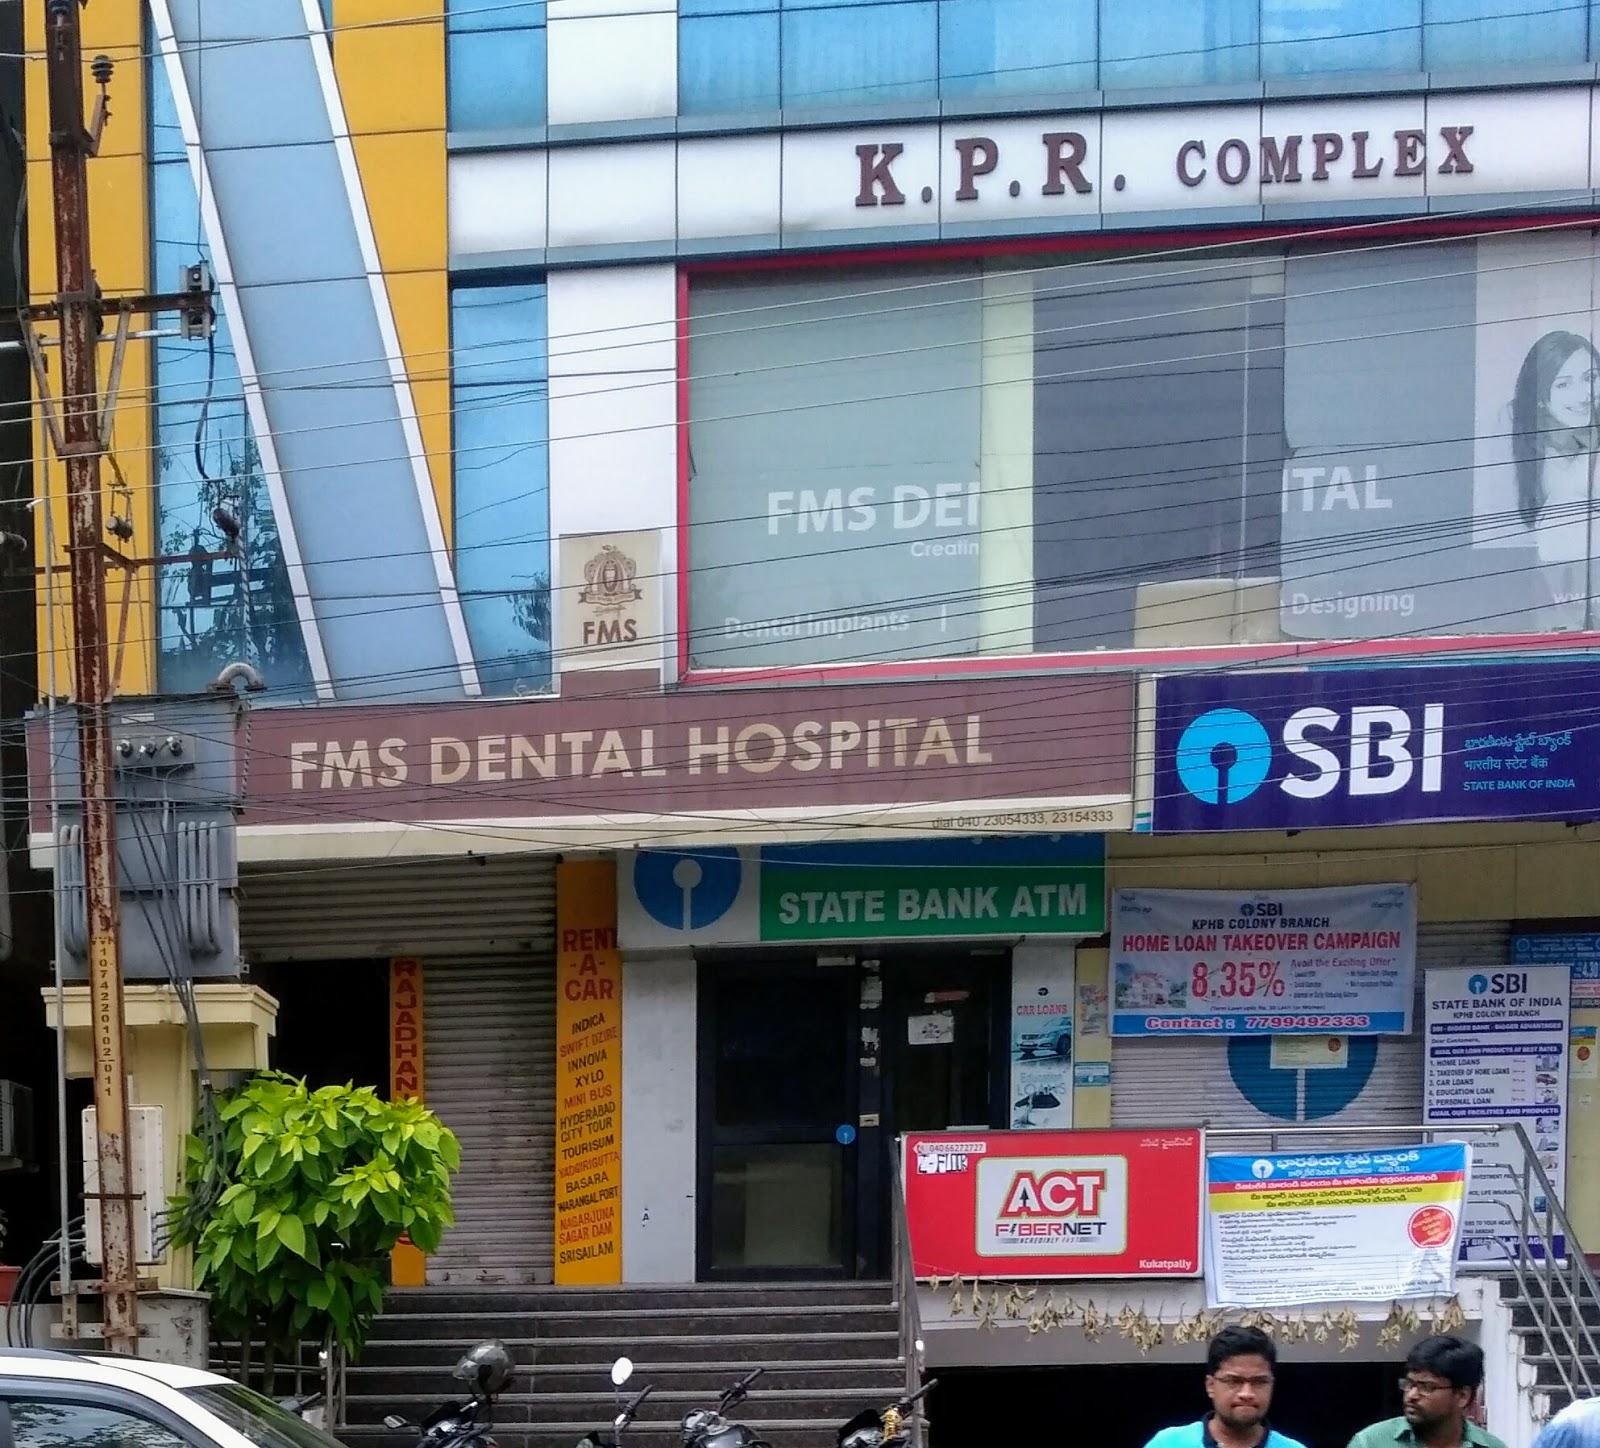 blood bank FMS DENTAL HOSPITAL near Hyderabad Telangana